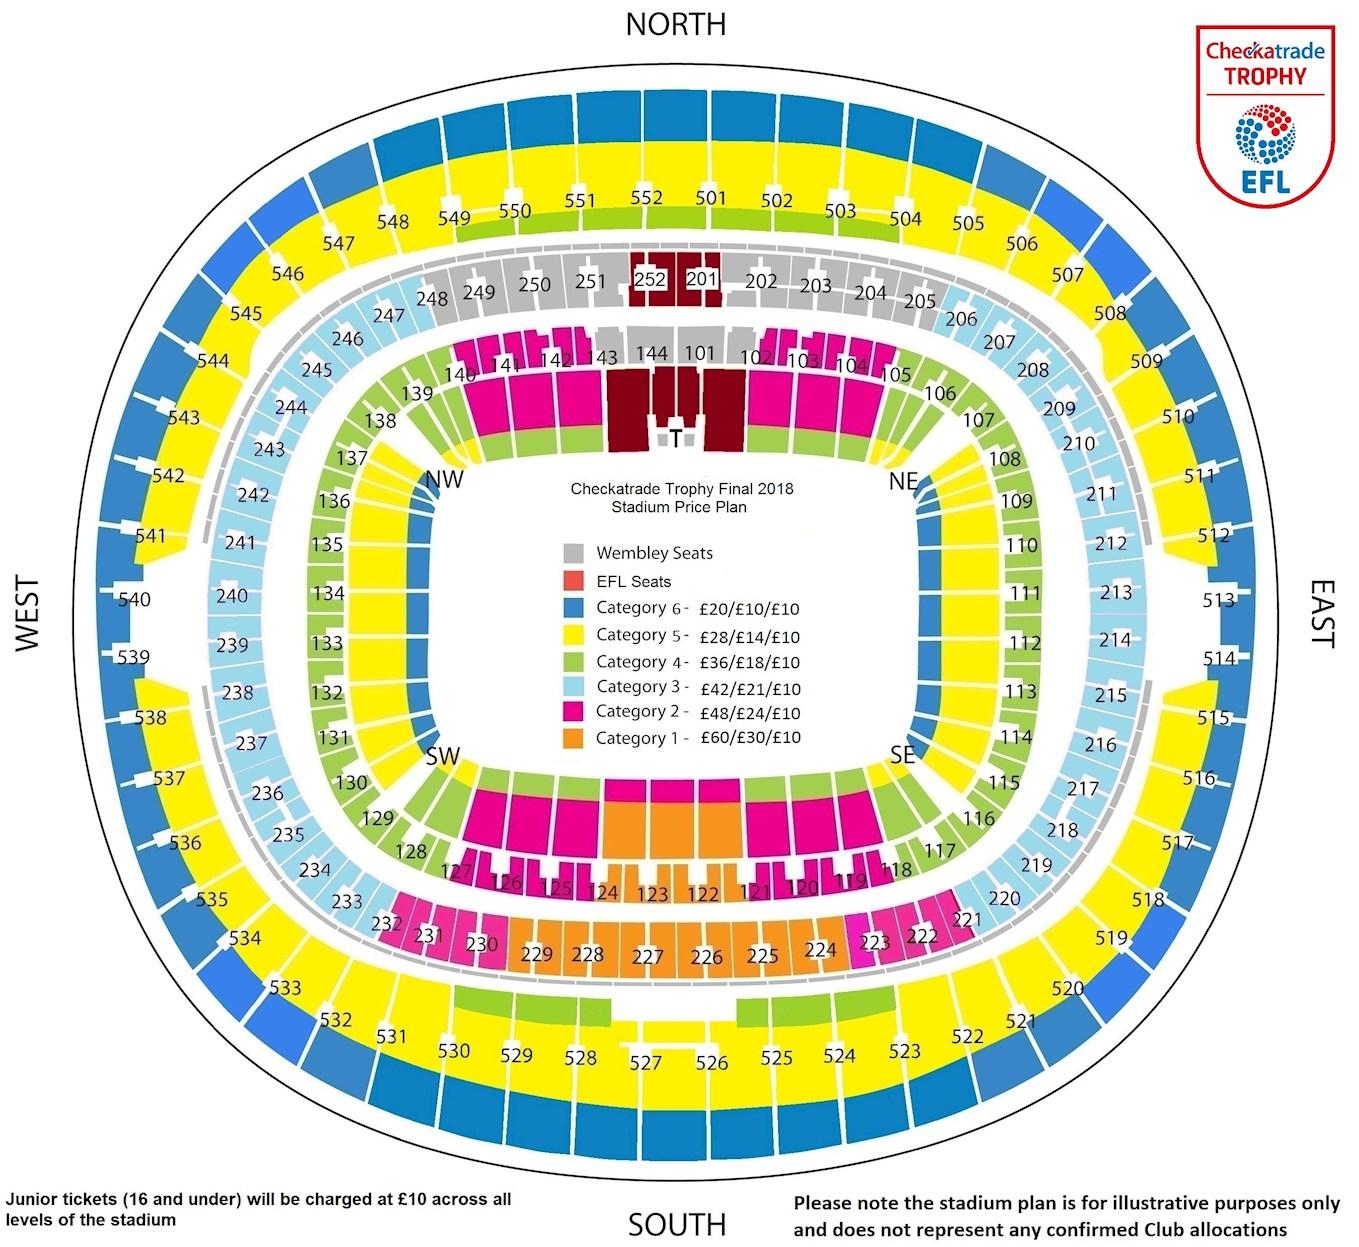 Ticket Prices Confirmed For Checkatrade Trophy Final